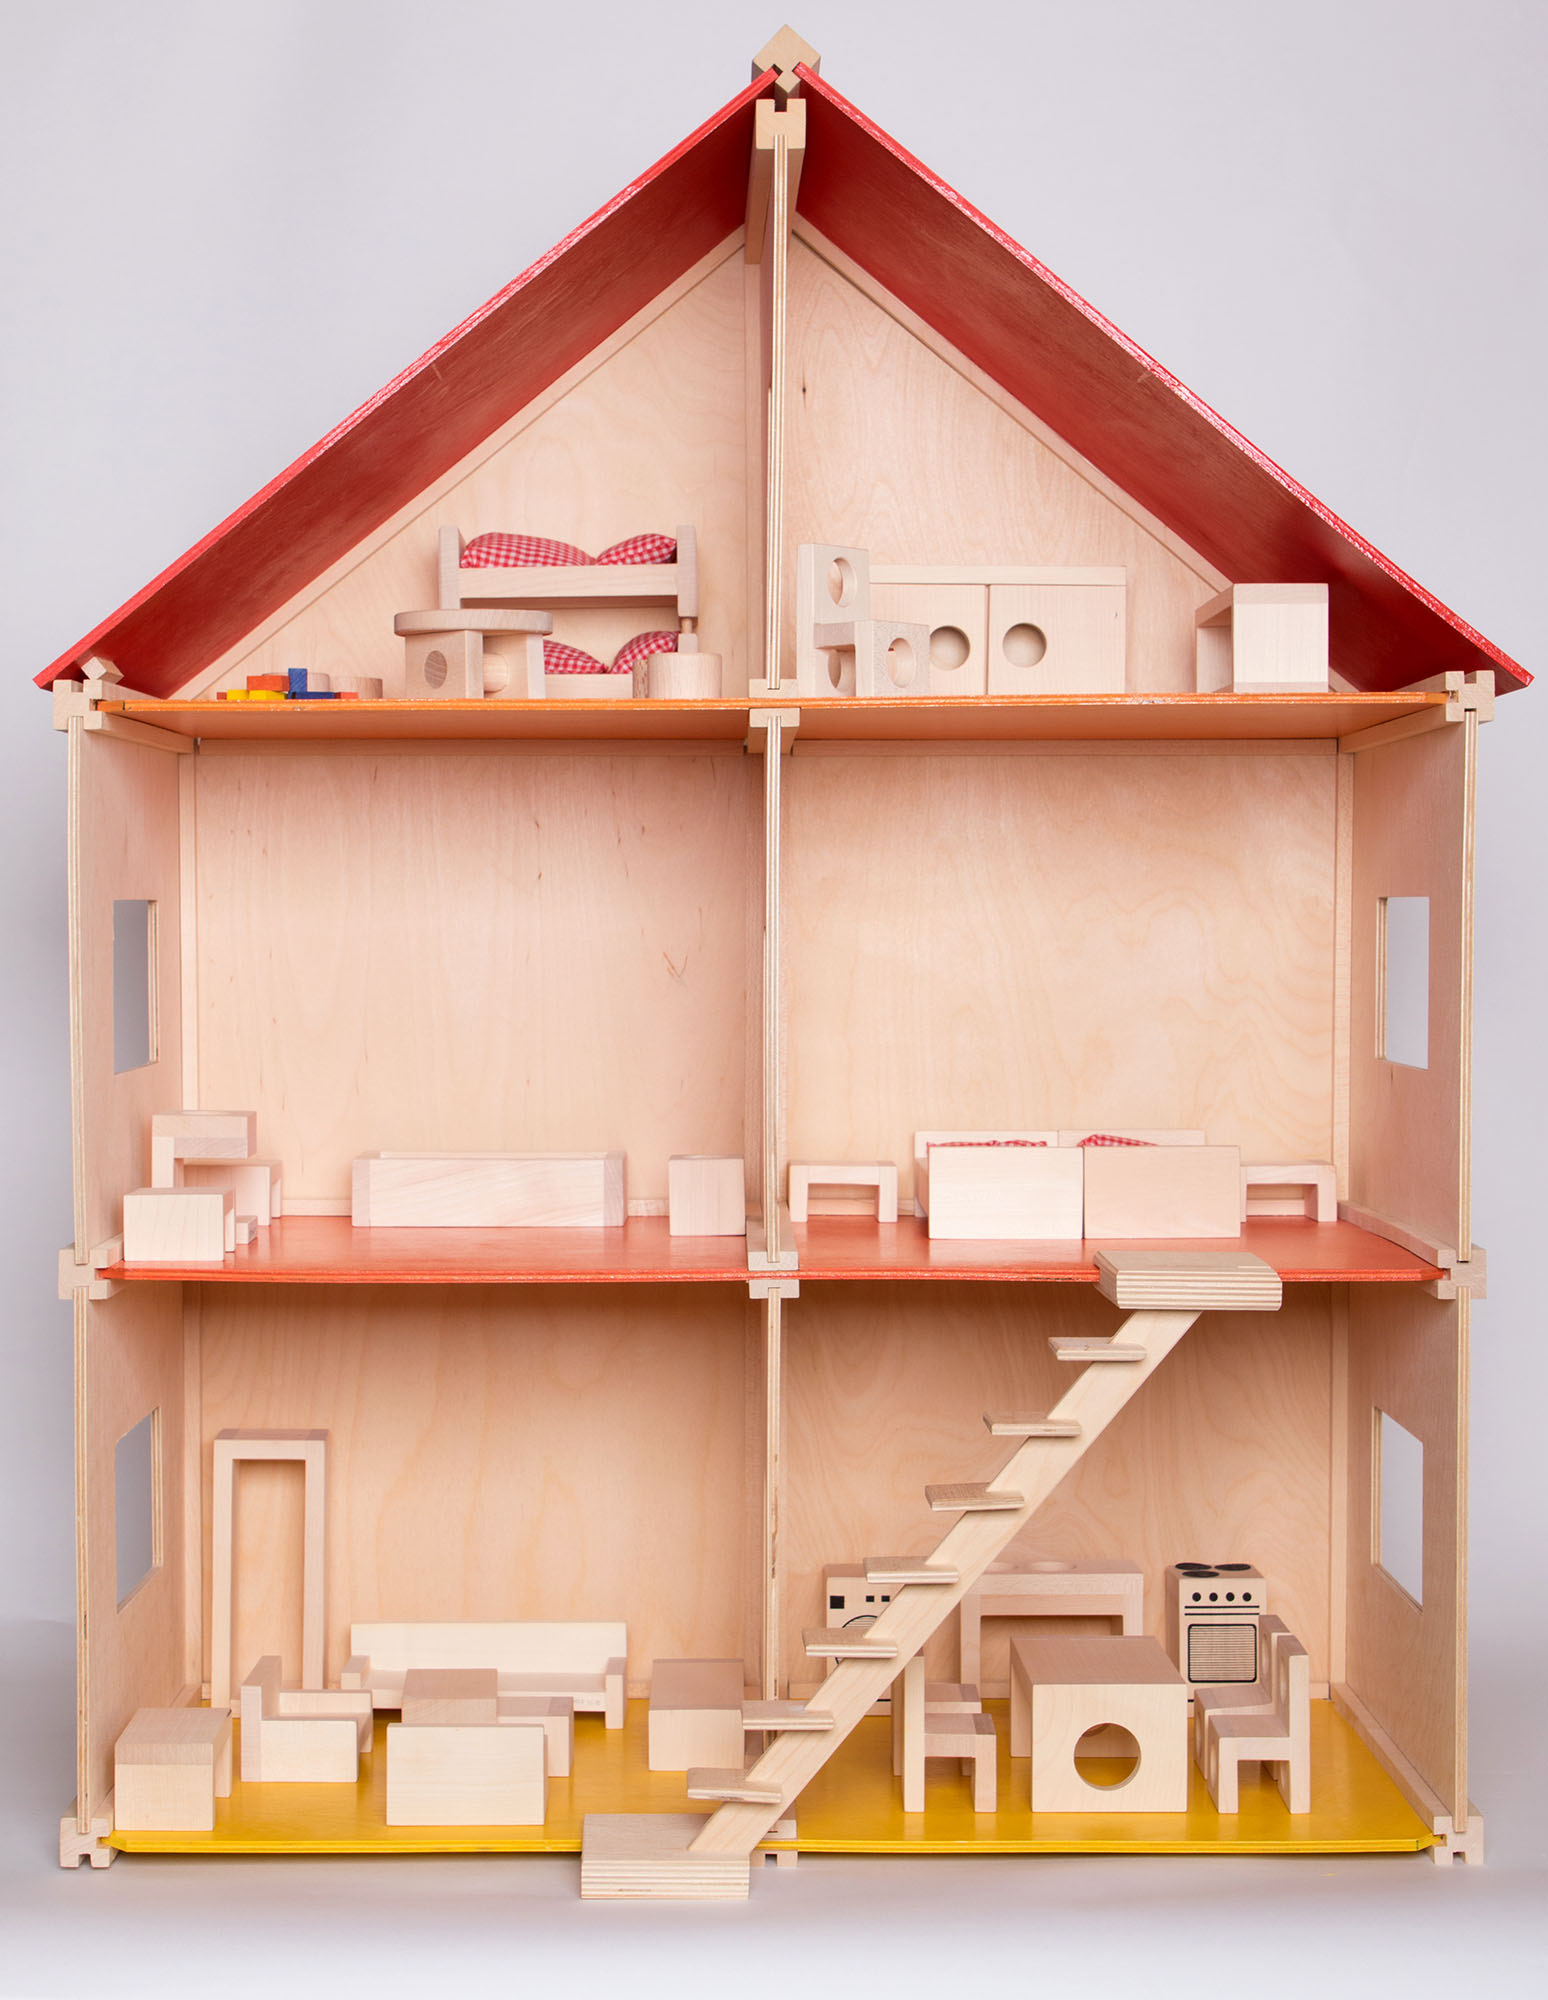 Nett Selecta Puppenhaus Kinderzimmer Fotos - Die Schlafzimmerideen ...